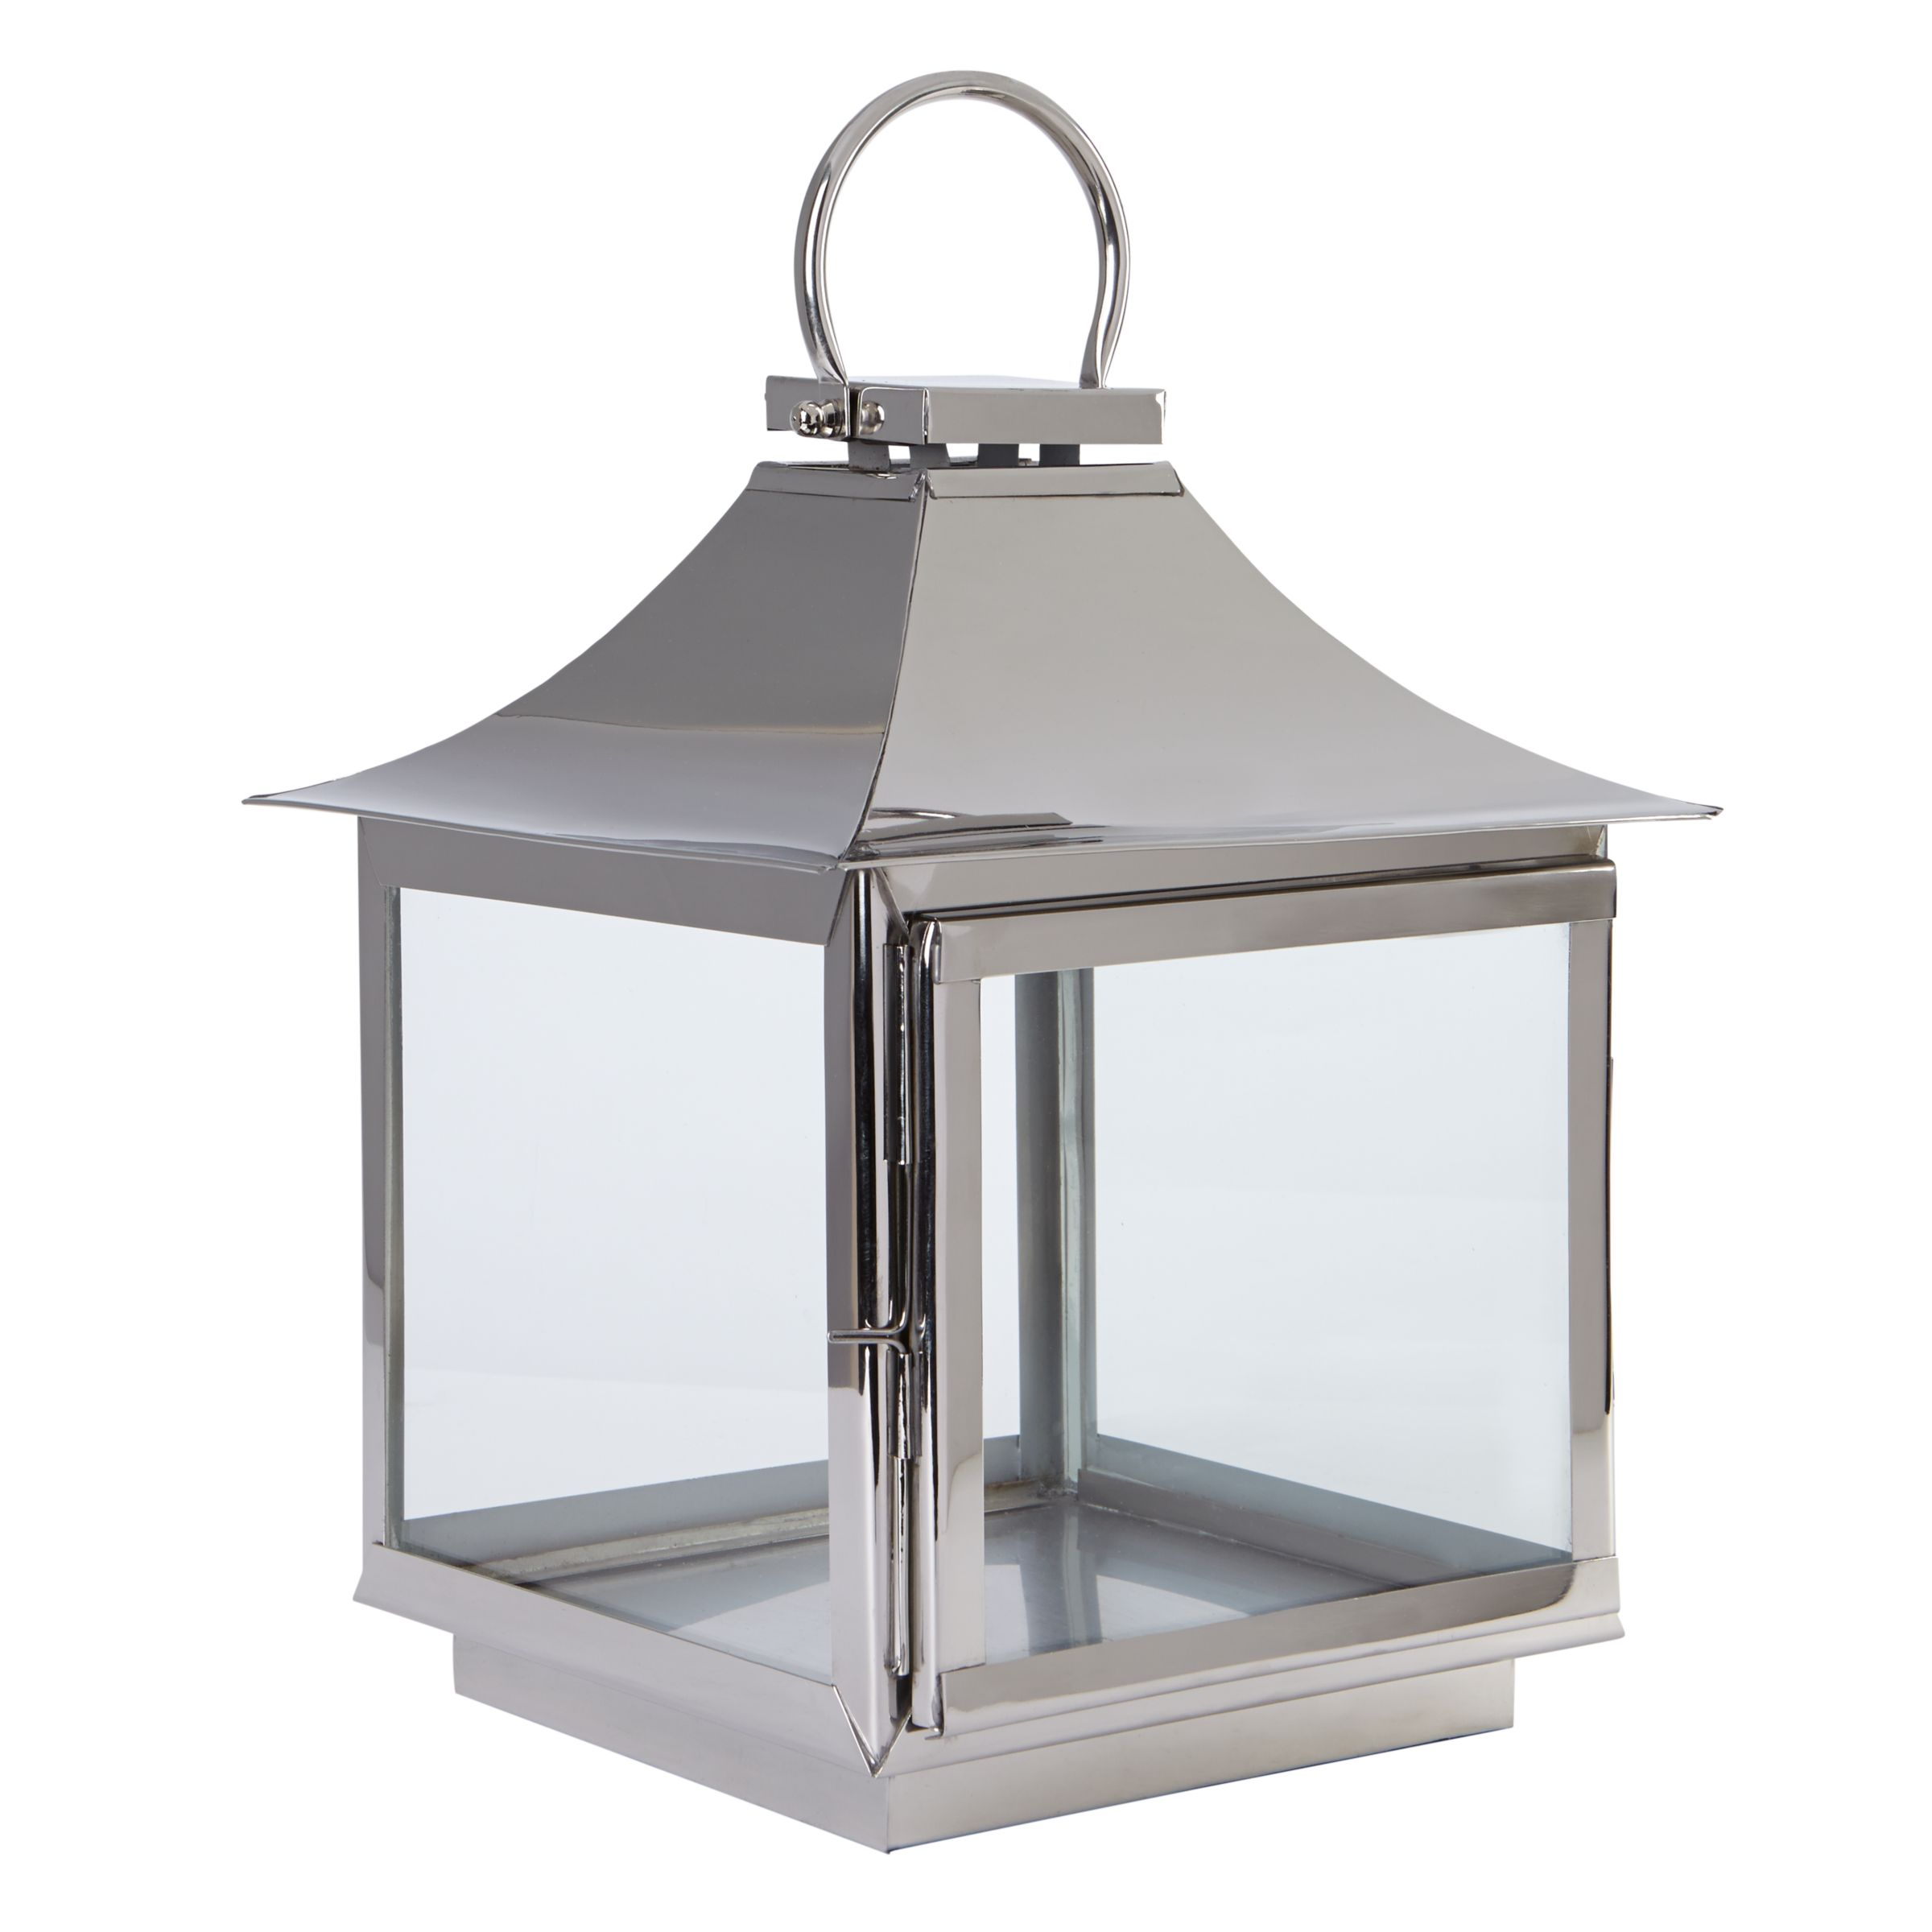 Foras Elveden Stainless Steel Lantern, Small